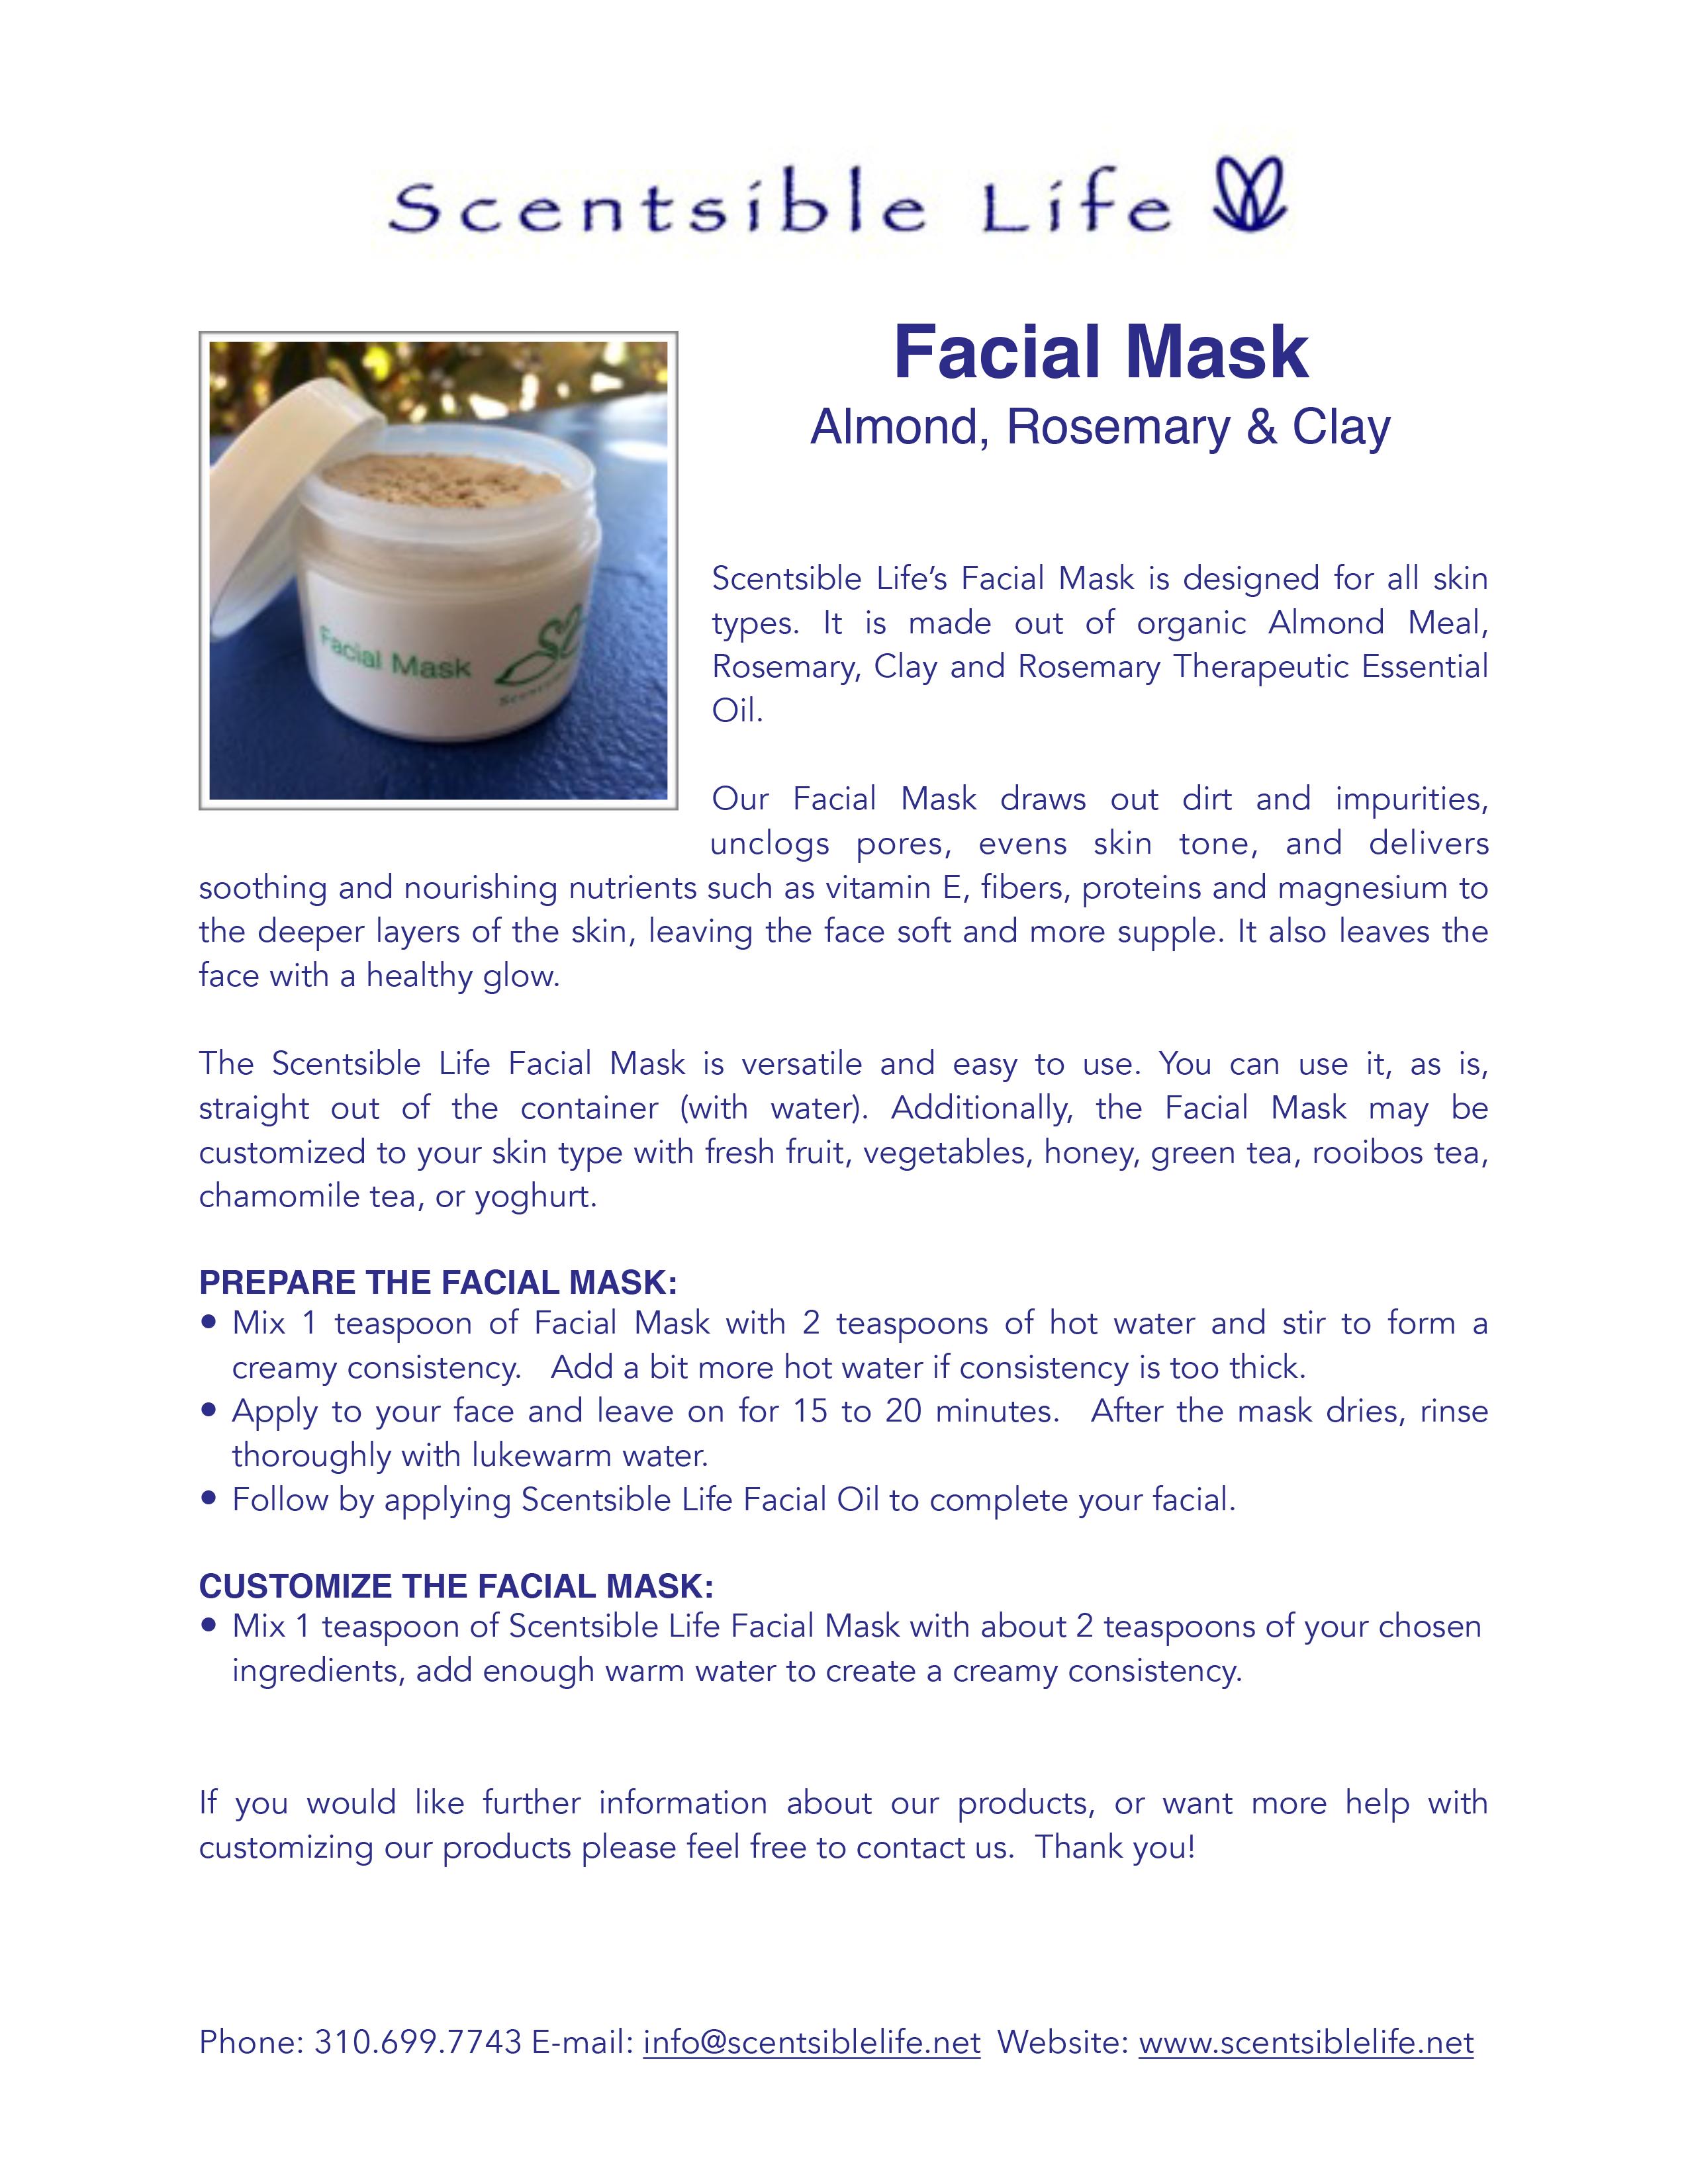 description-of-the-facial-mask.png